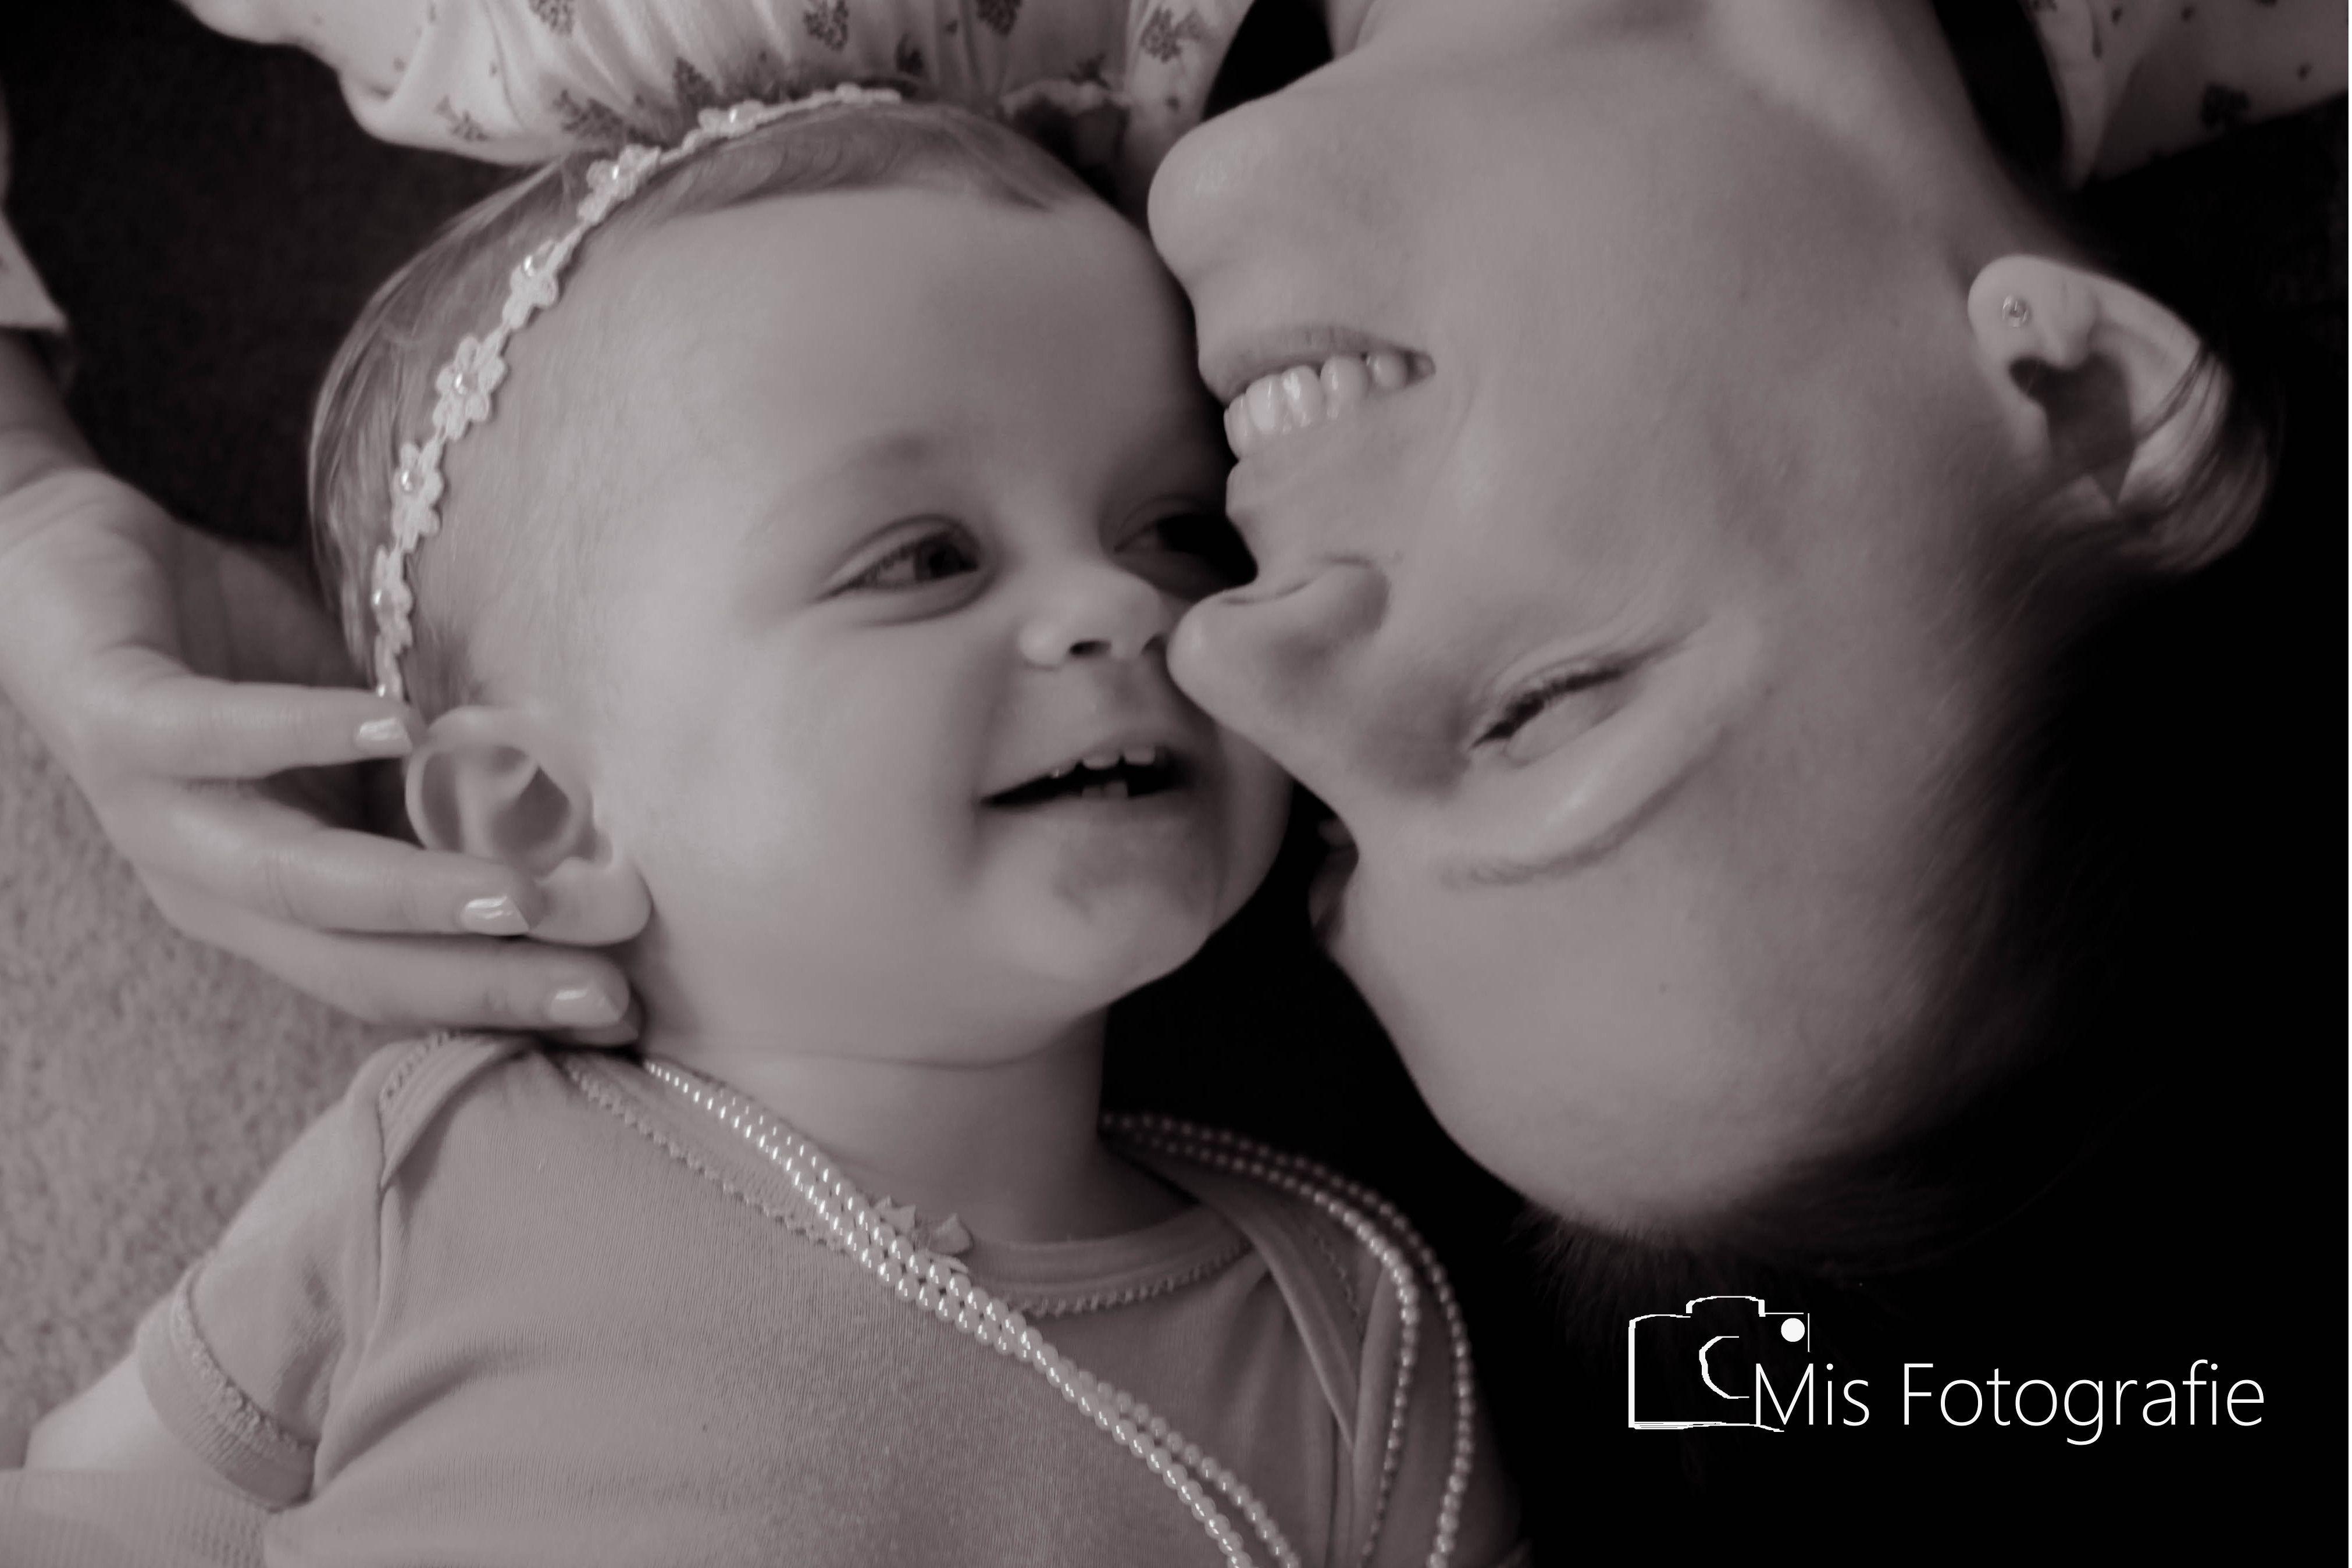 Mutter - Tochter Liebe! | Mutter tochter, Tochter, Mutter